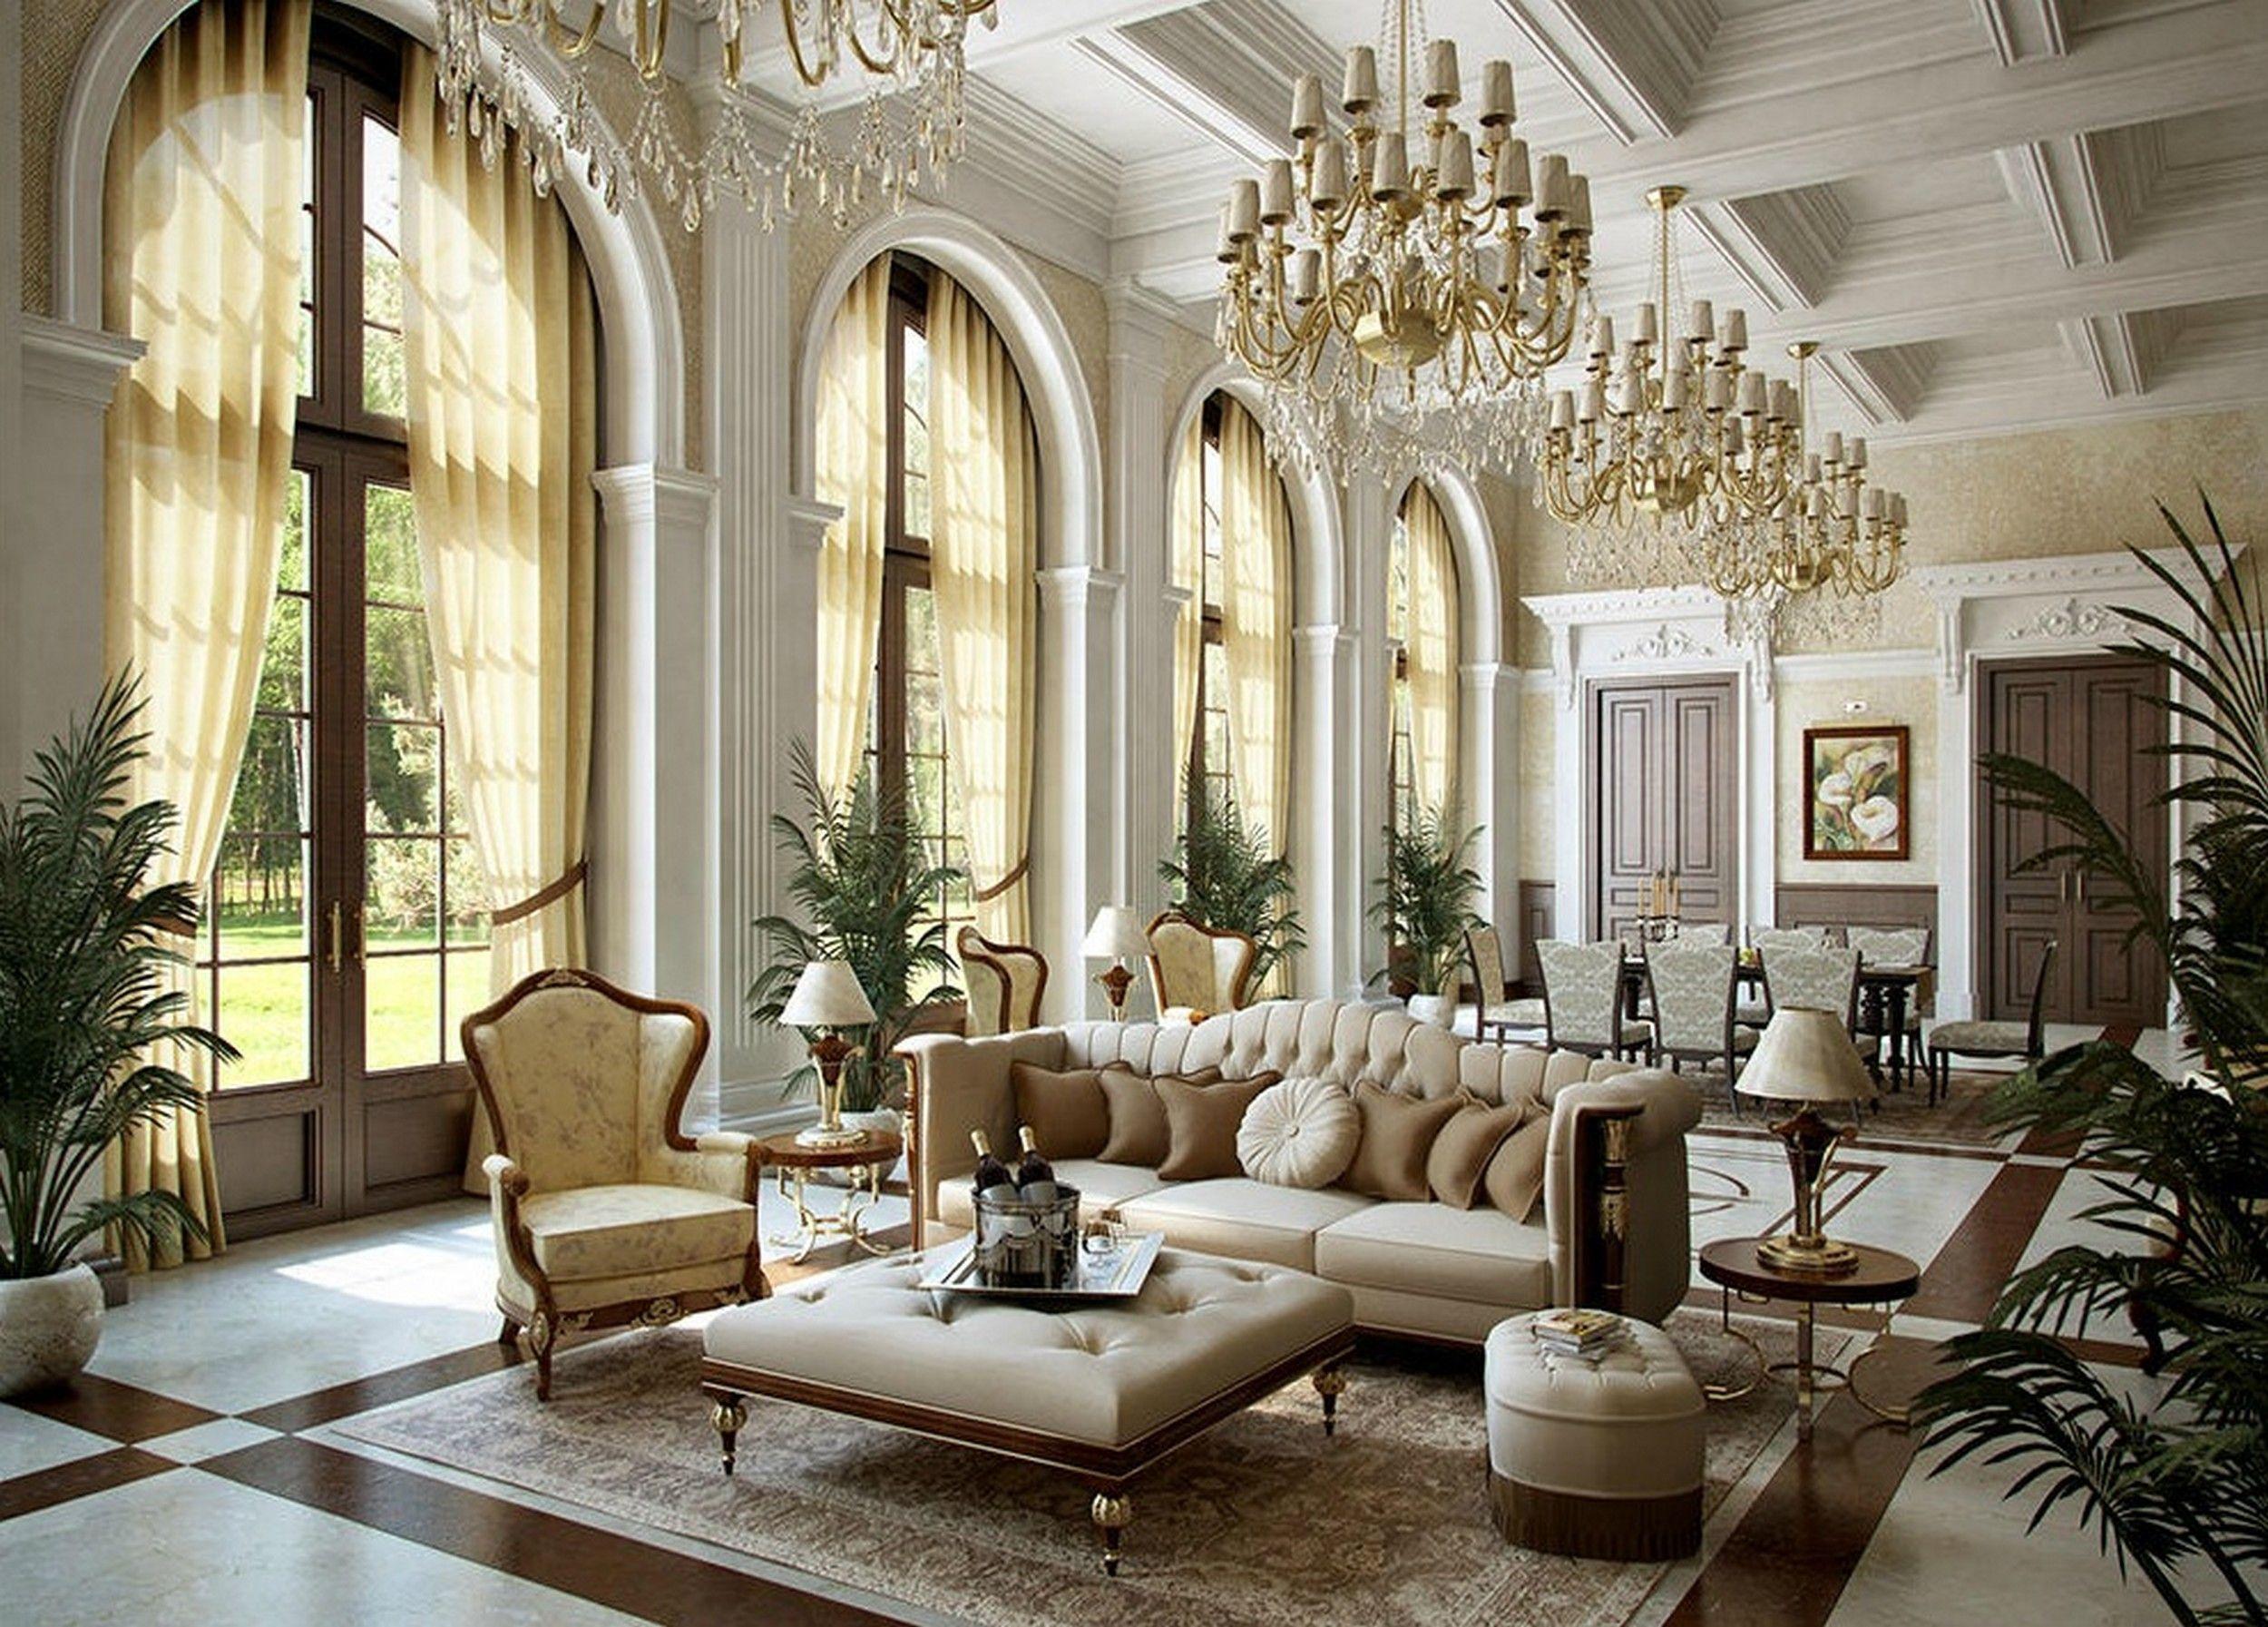 awesome hd 1713 victorian living room undolock isgif for victorian rh pinterest com